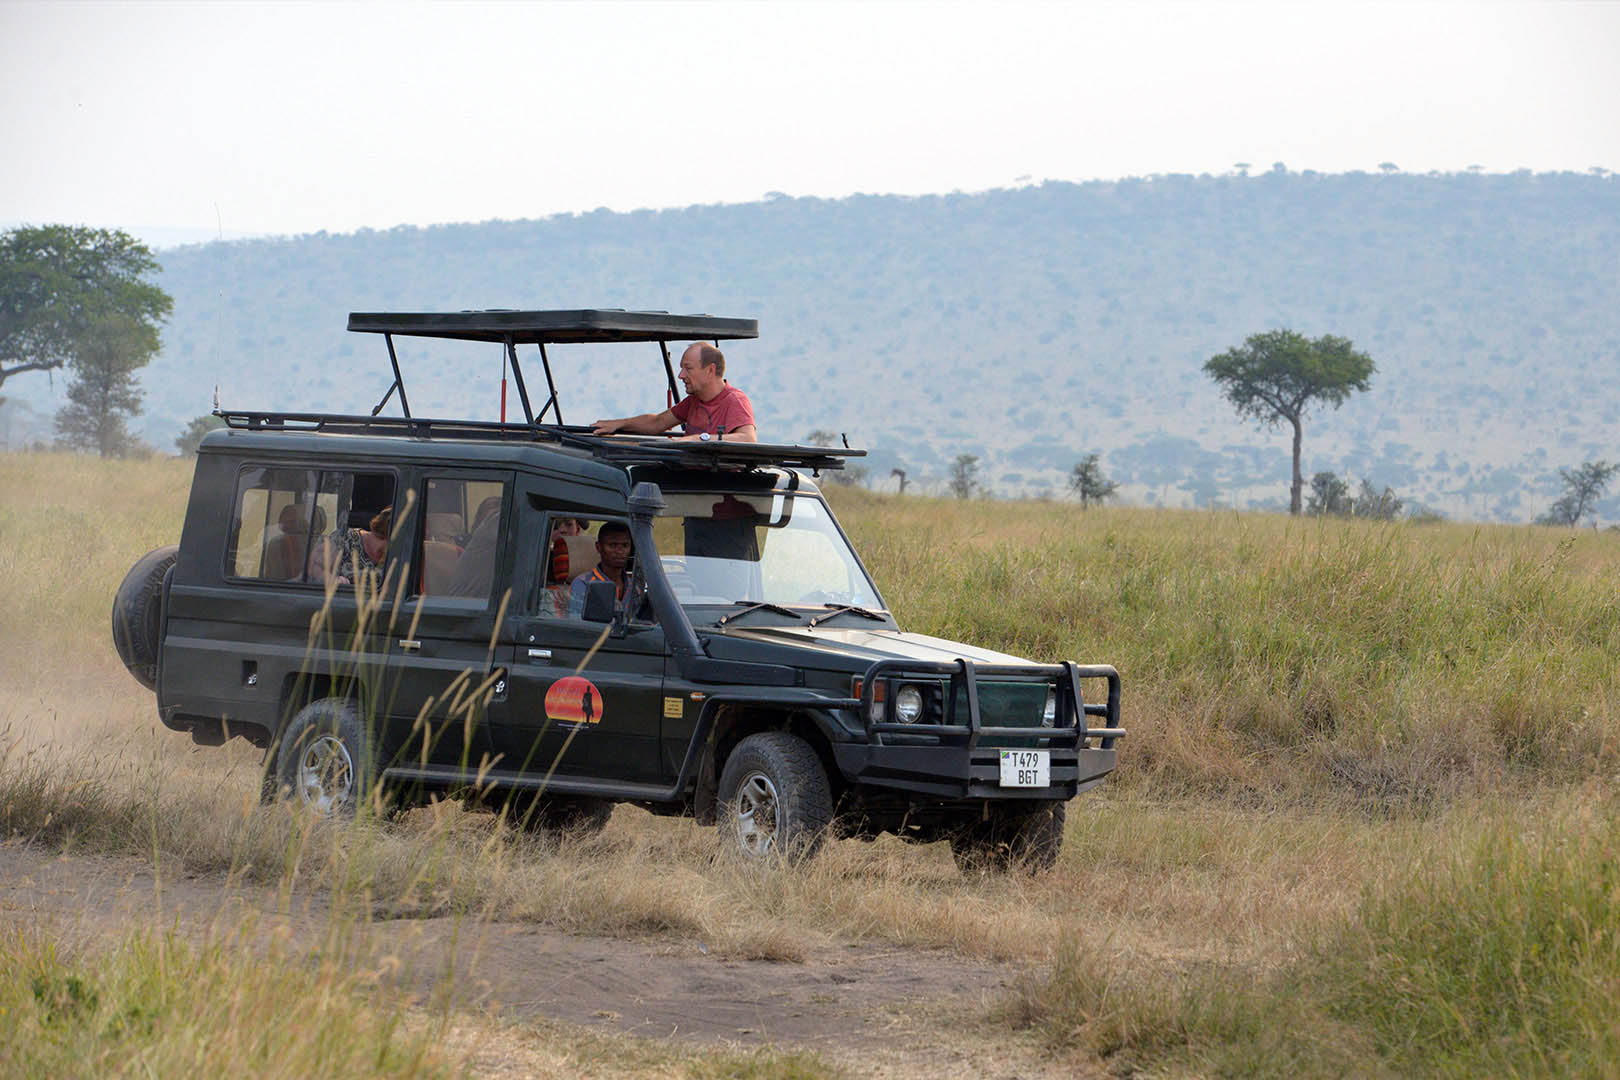 gallery-maasai-wanderings-safari-itineraries-signature-photo-safaris-africa-guided-tour